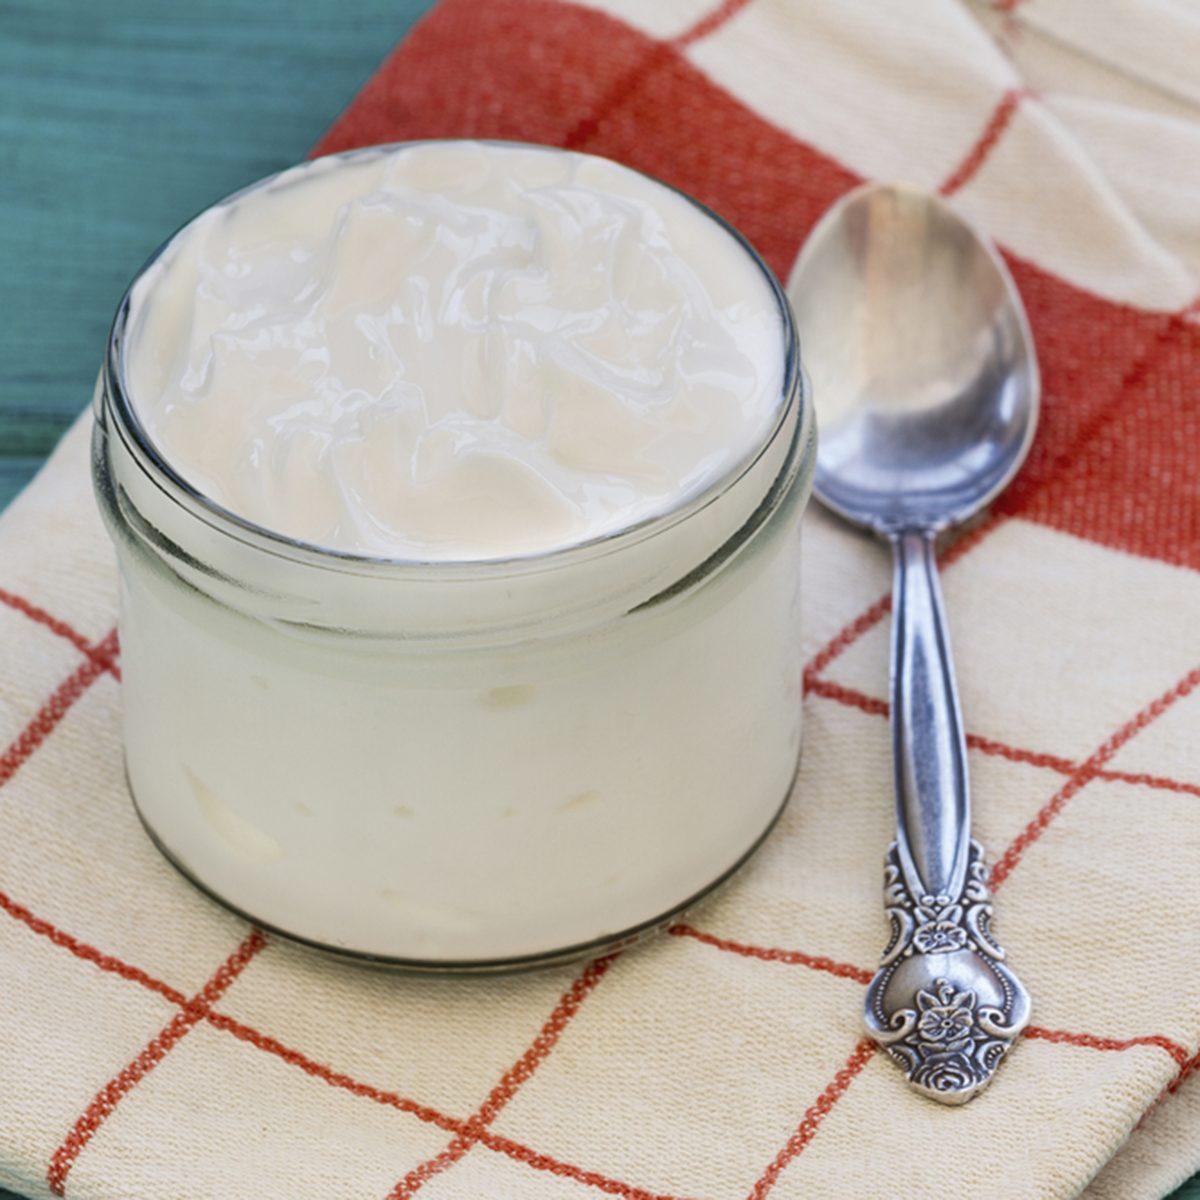 Greek Yogurt or Plain Yogurt and a spoon on a vintage wood background.